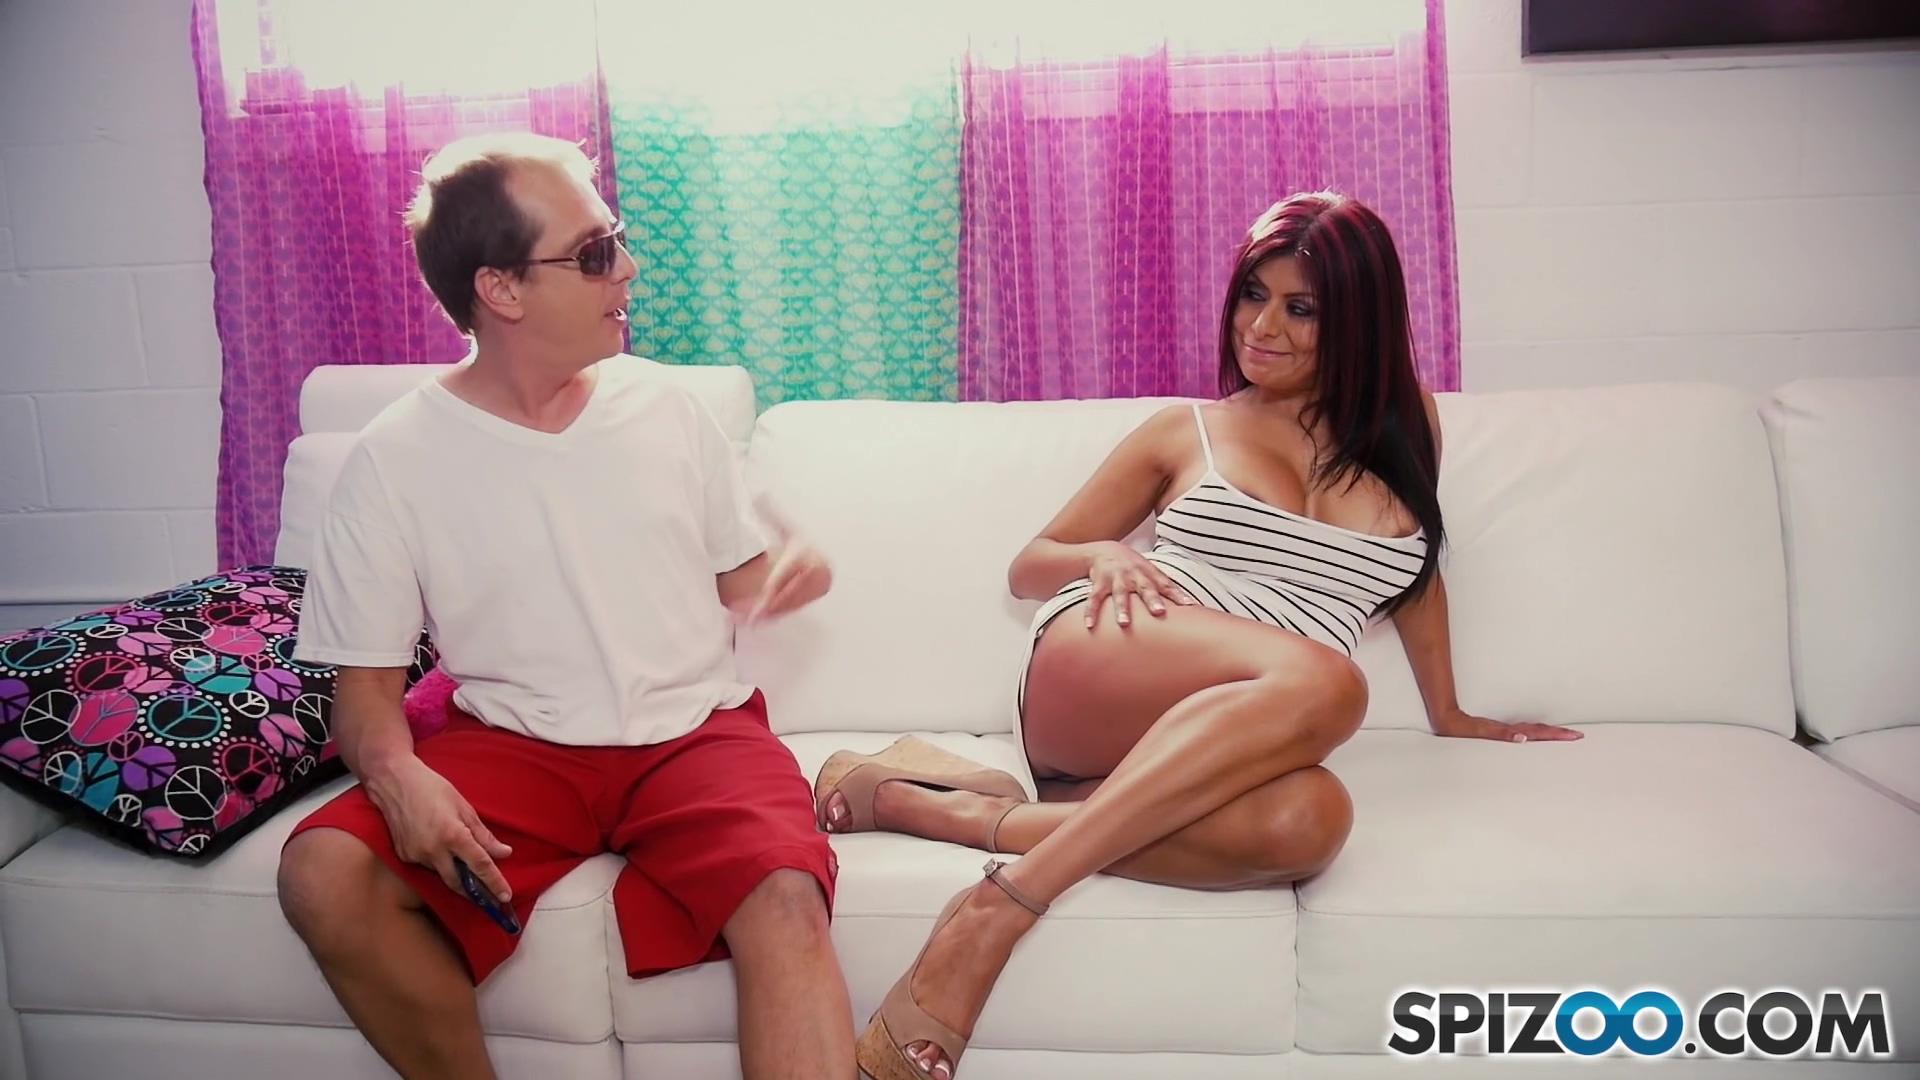 Video 1412838604: gabby quinteros, hairy milfs big tits, hairy latin milf, hairy brunette milf, hairy milf hd